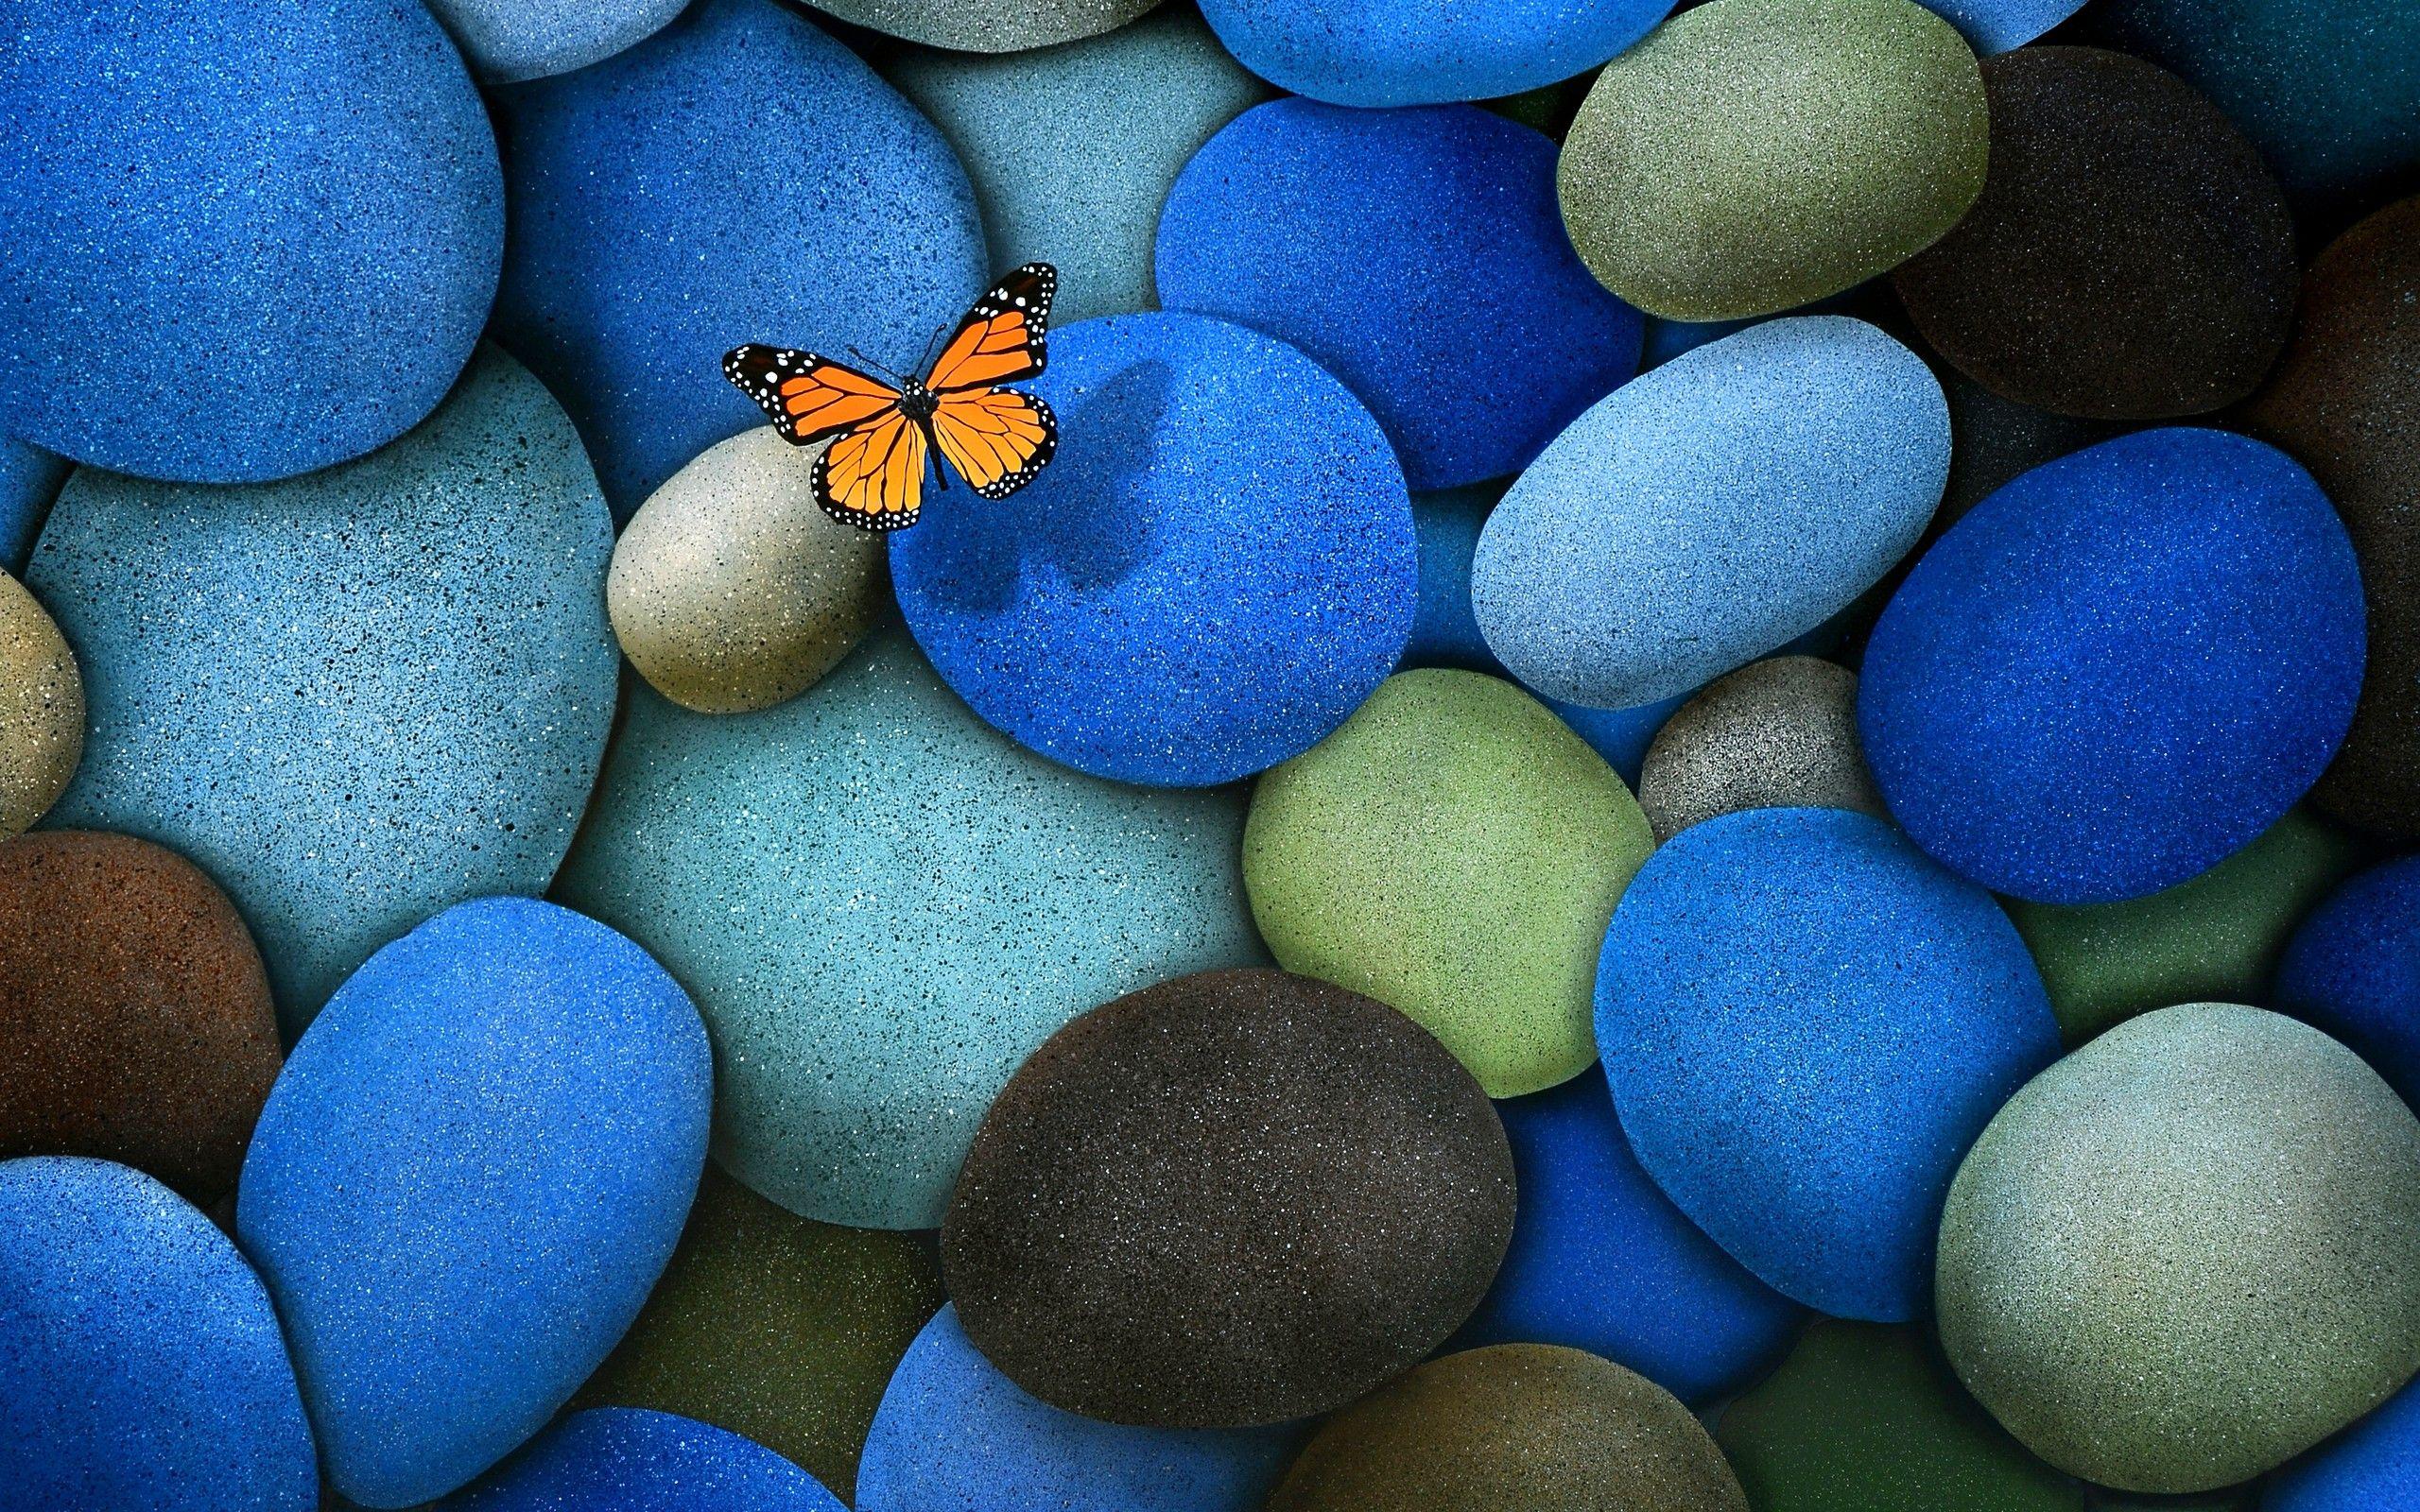 Butterfly On Blue Stones In 2020 Butterfly Wallpaper Beautiful Wallpapers Stone Wallpaper